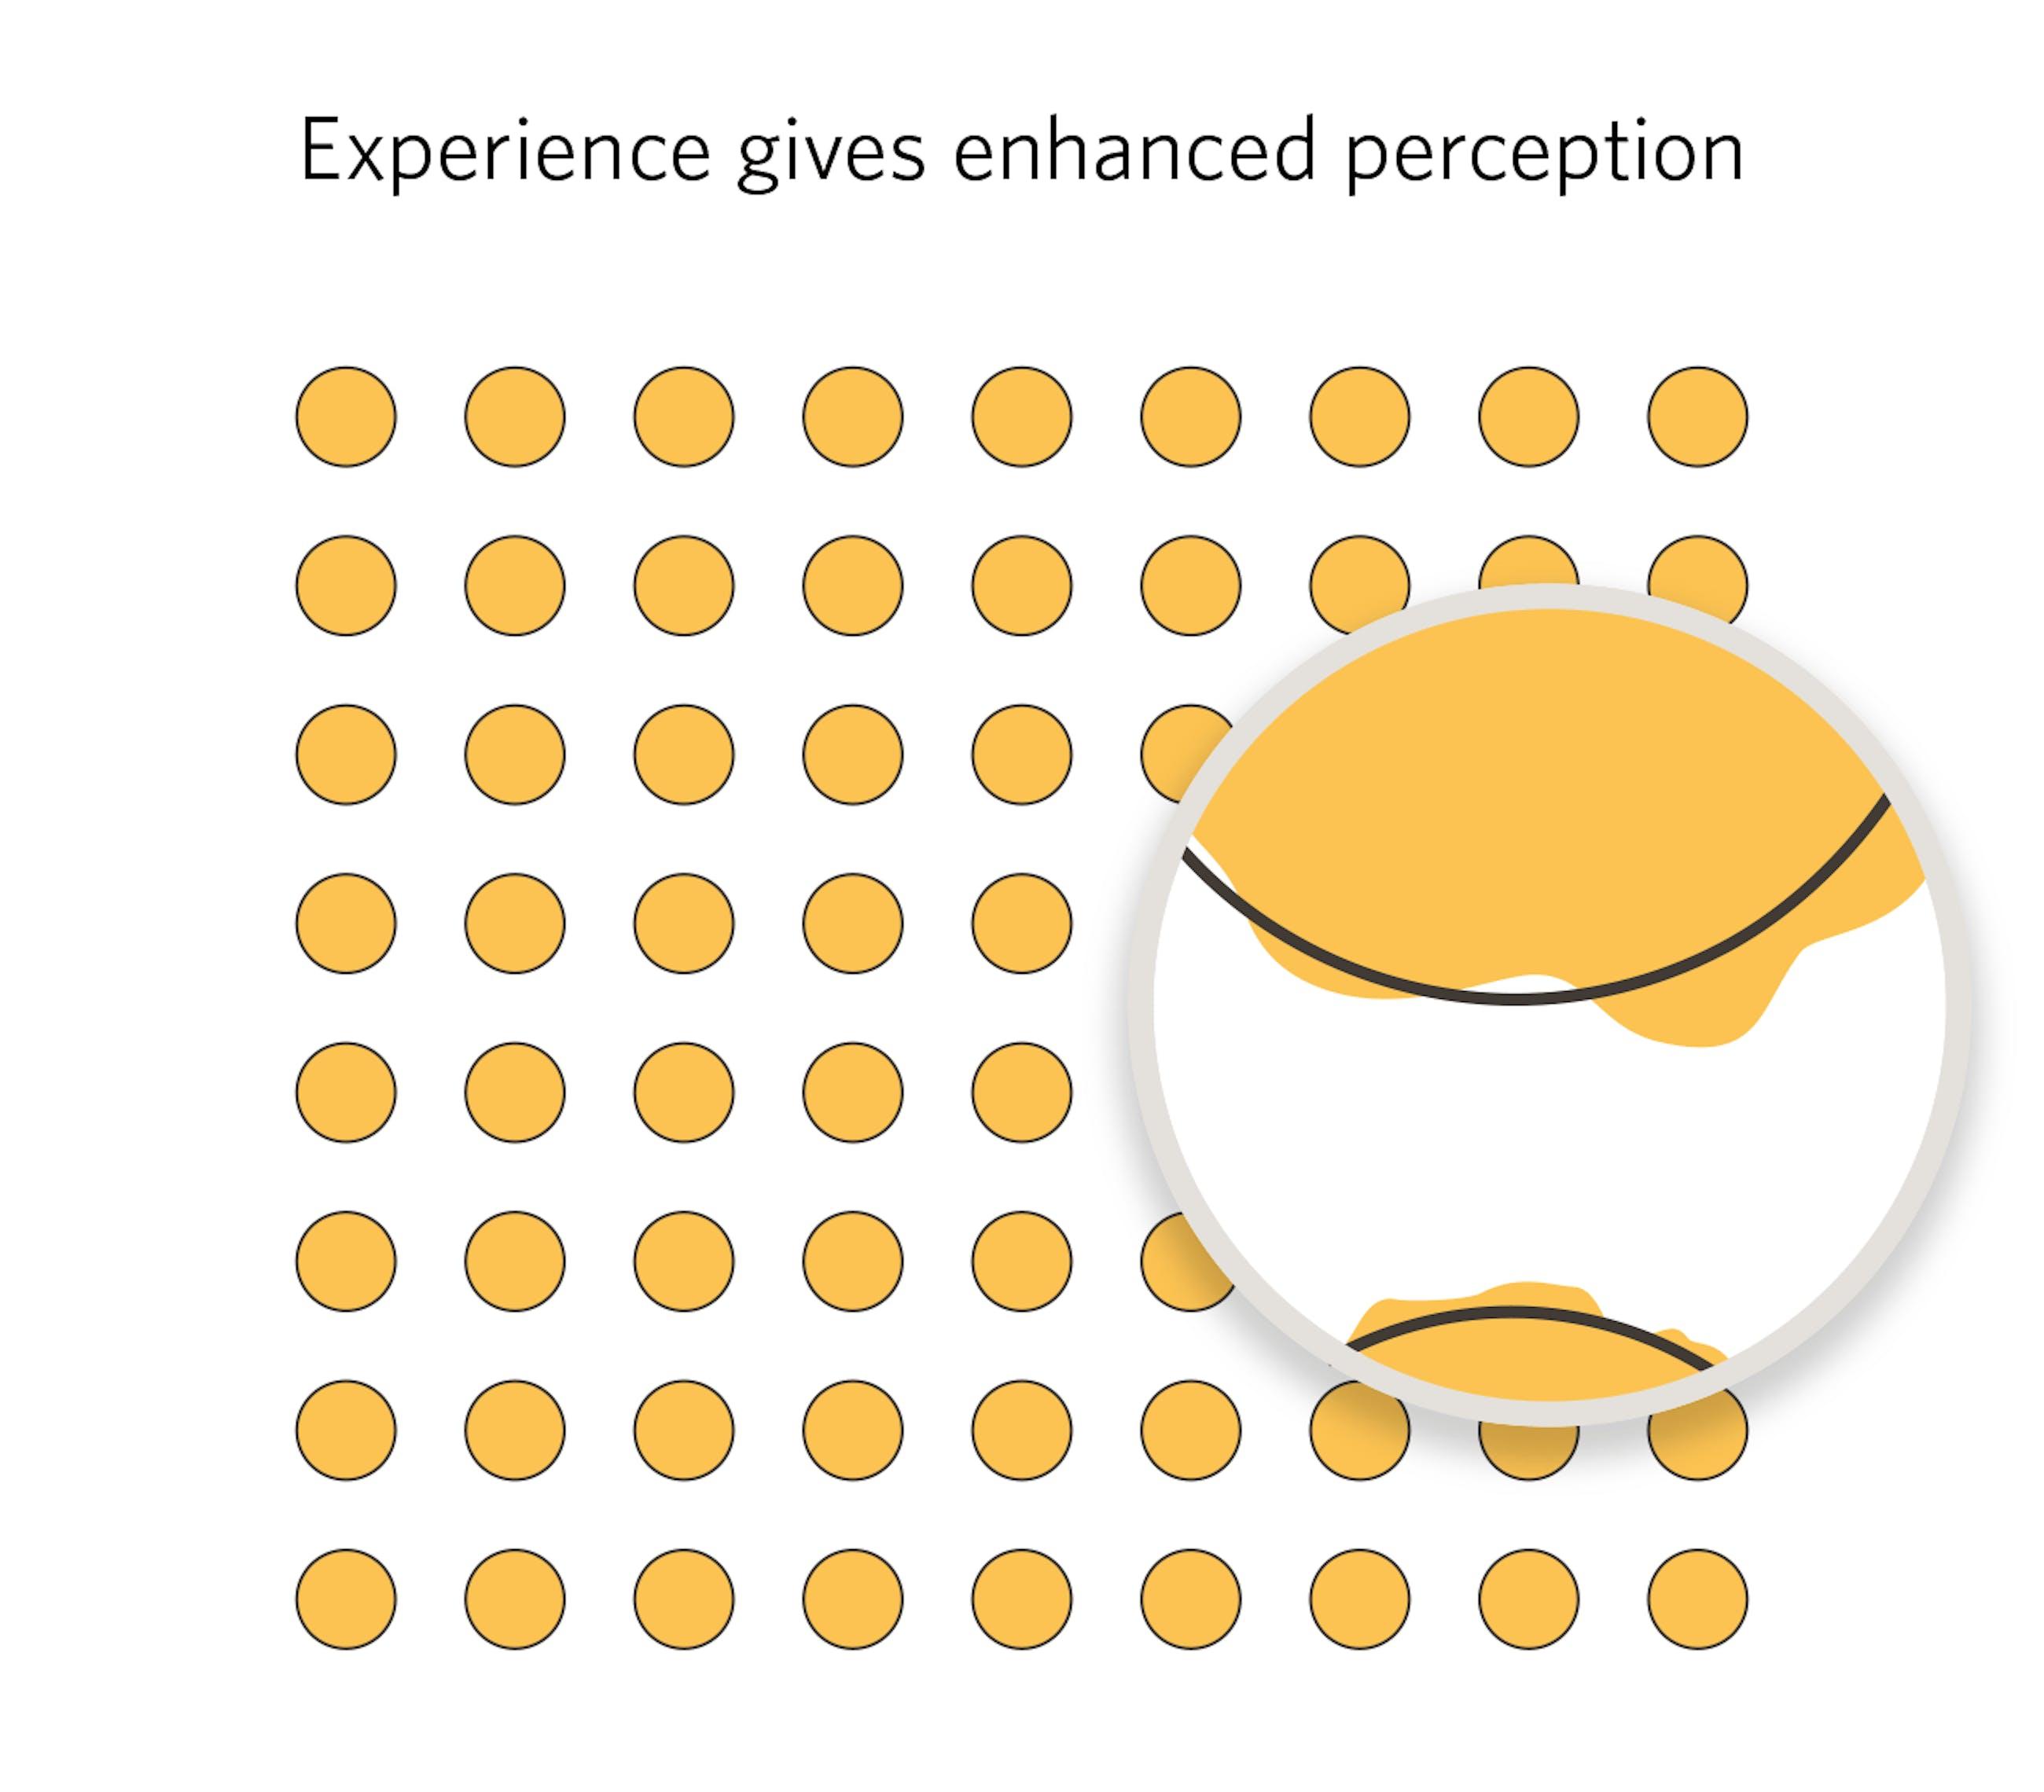 Enhanced perception